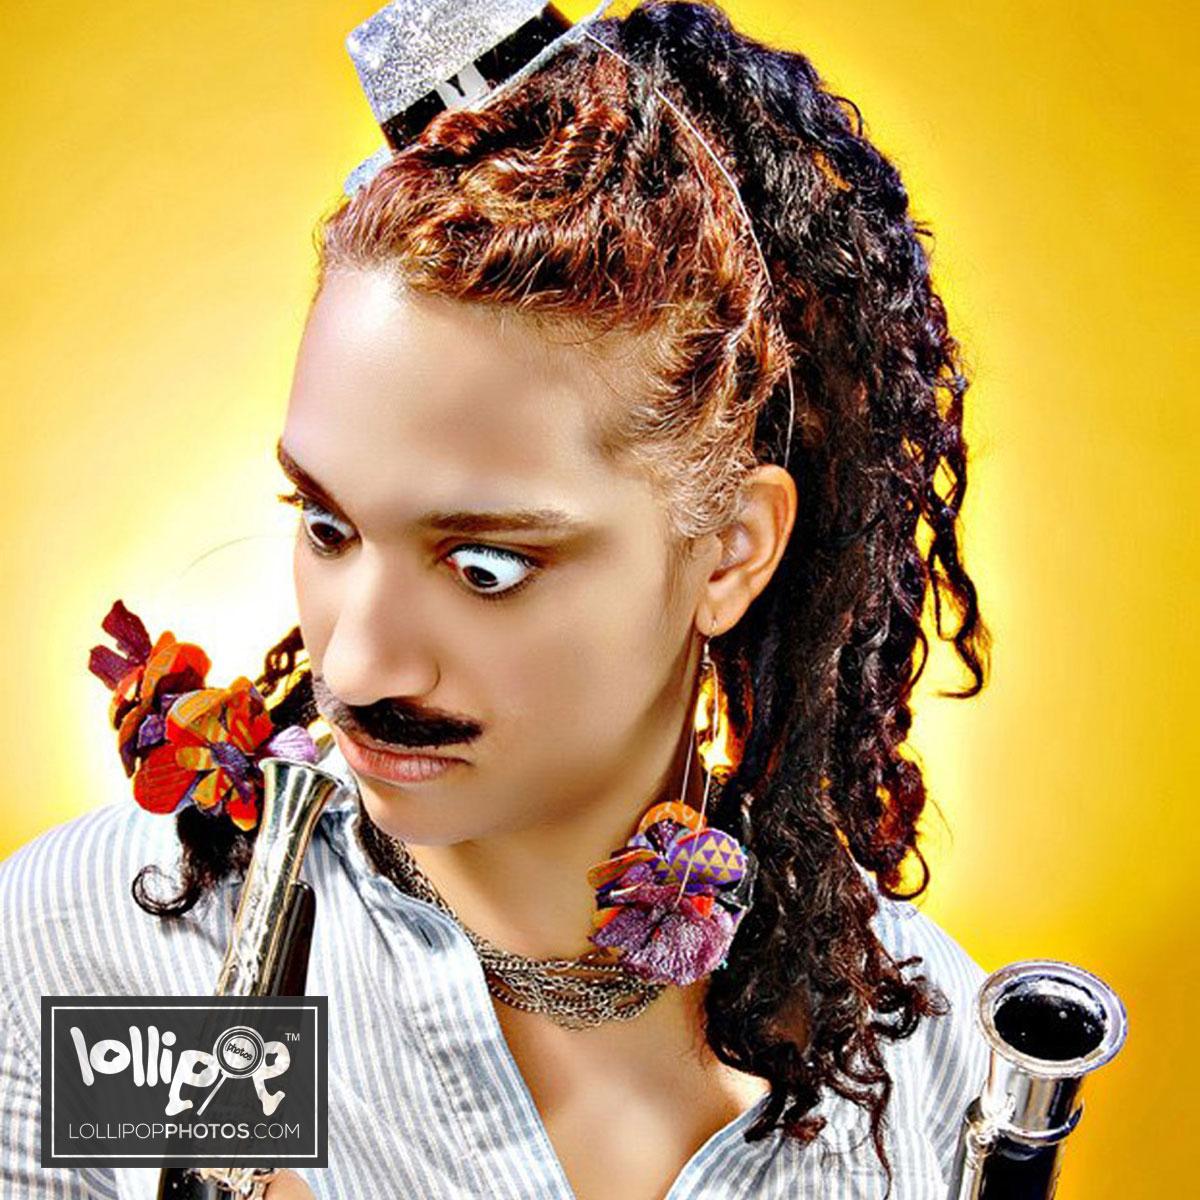 msdig-nora-canfield-lollipop-photos-092.jpg